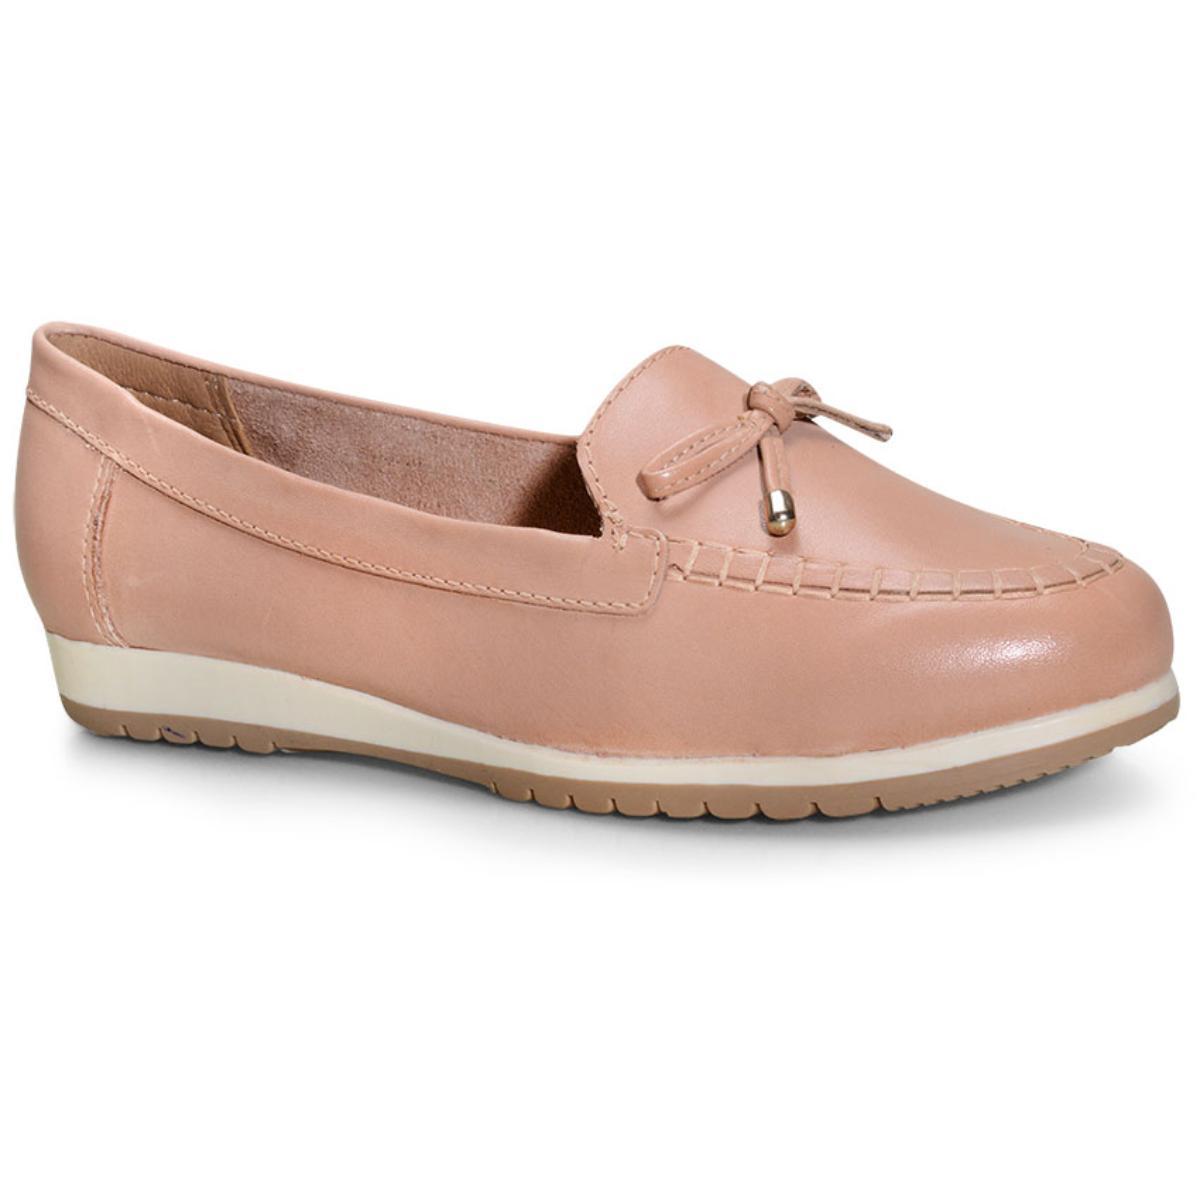 Sapato Feminino Bottero 310310 Brown Sugar